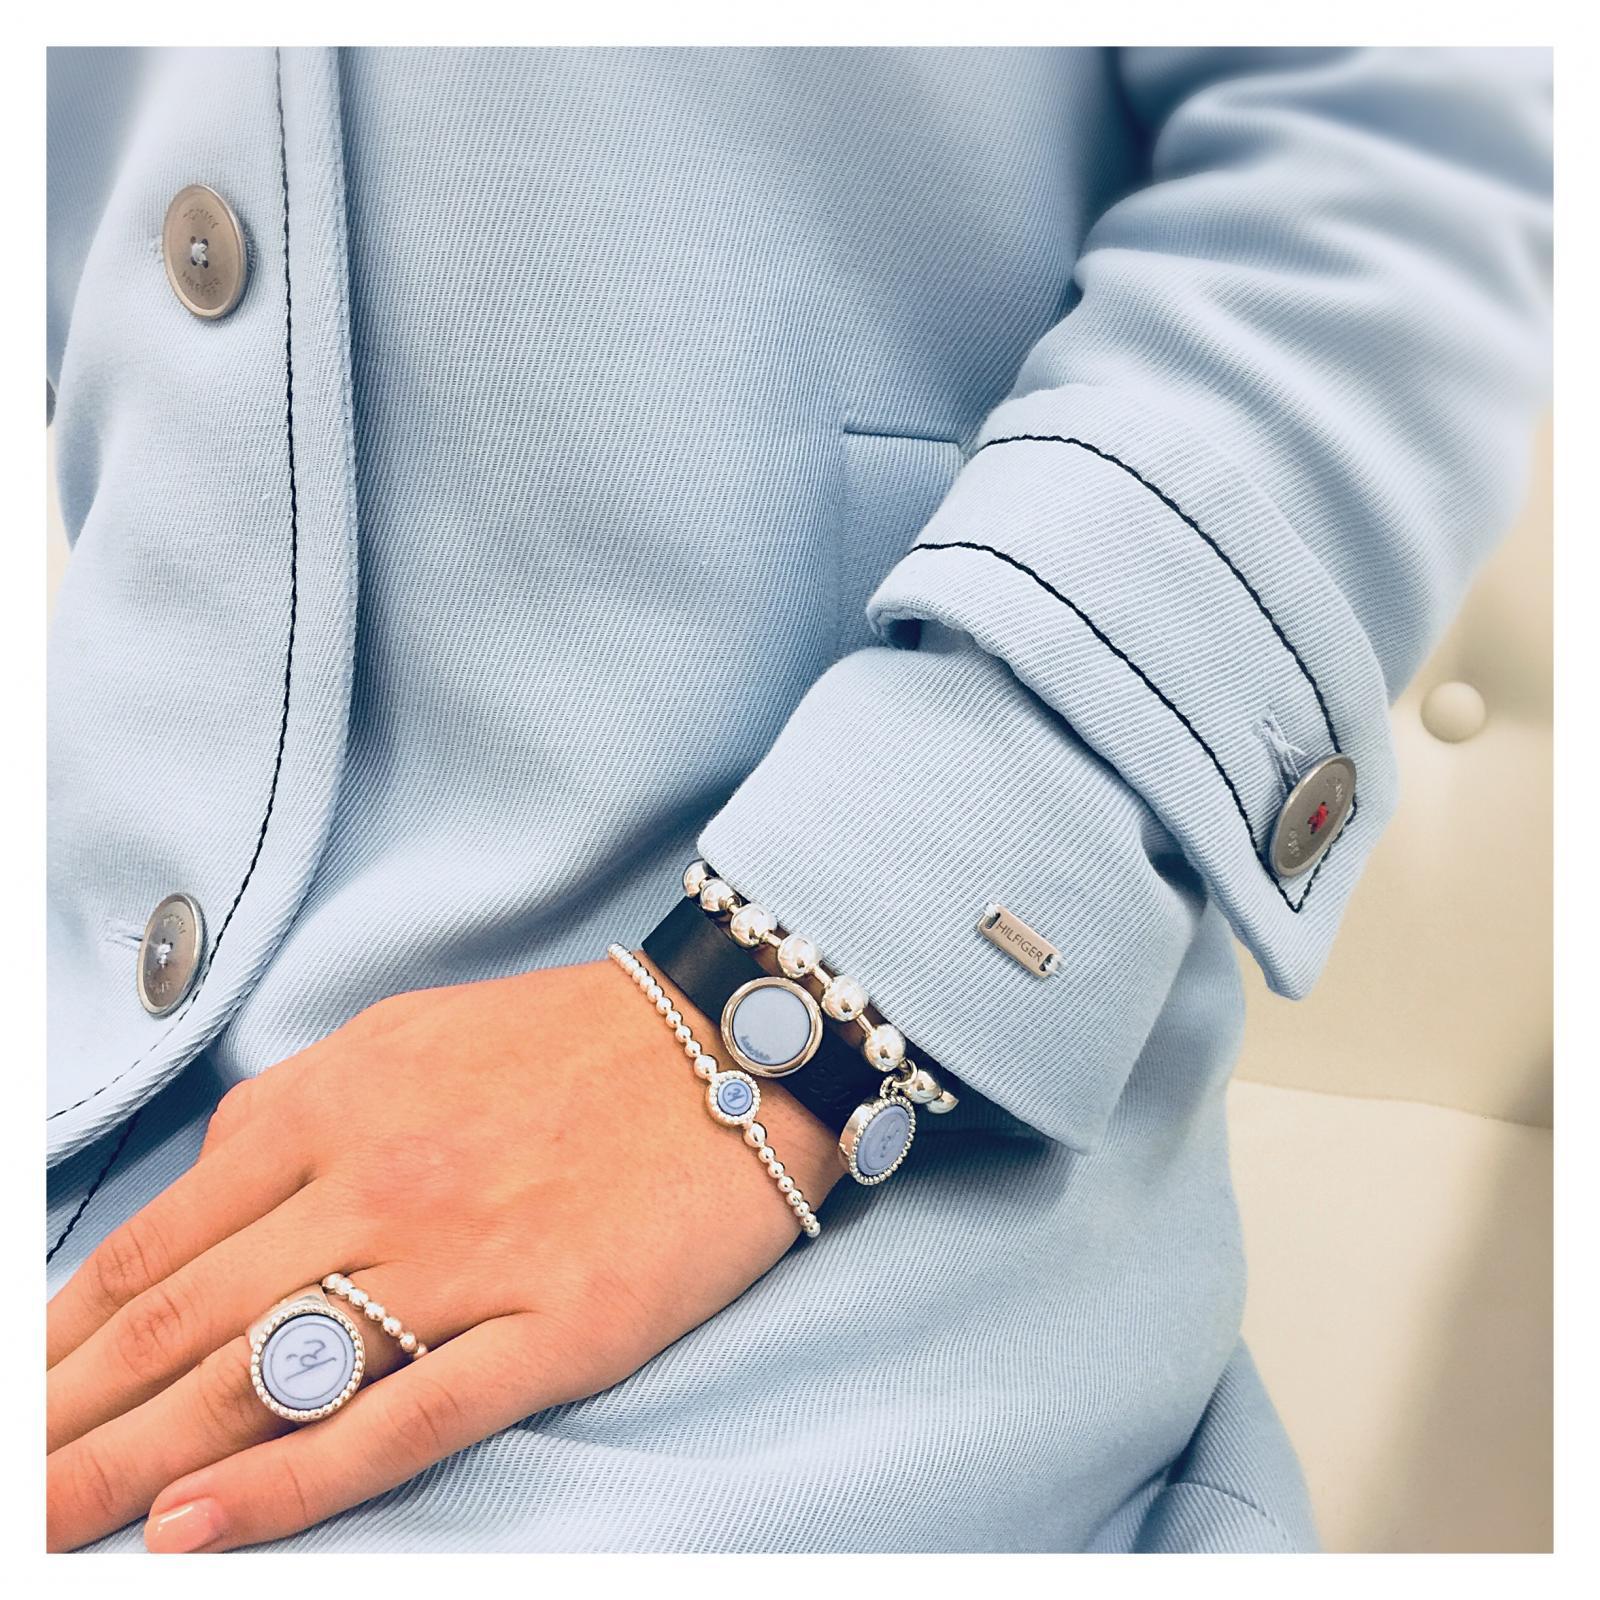 Plated zilveren ballchain armband Flexibele 925 sterling zilveren ring Flexibele 925 sterling zilveren armband Wisselbare 925 sterling zilveren ring Leren armband navy 925 sterling zilveren schuiver